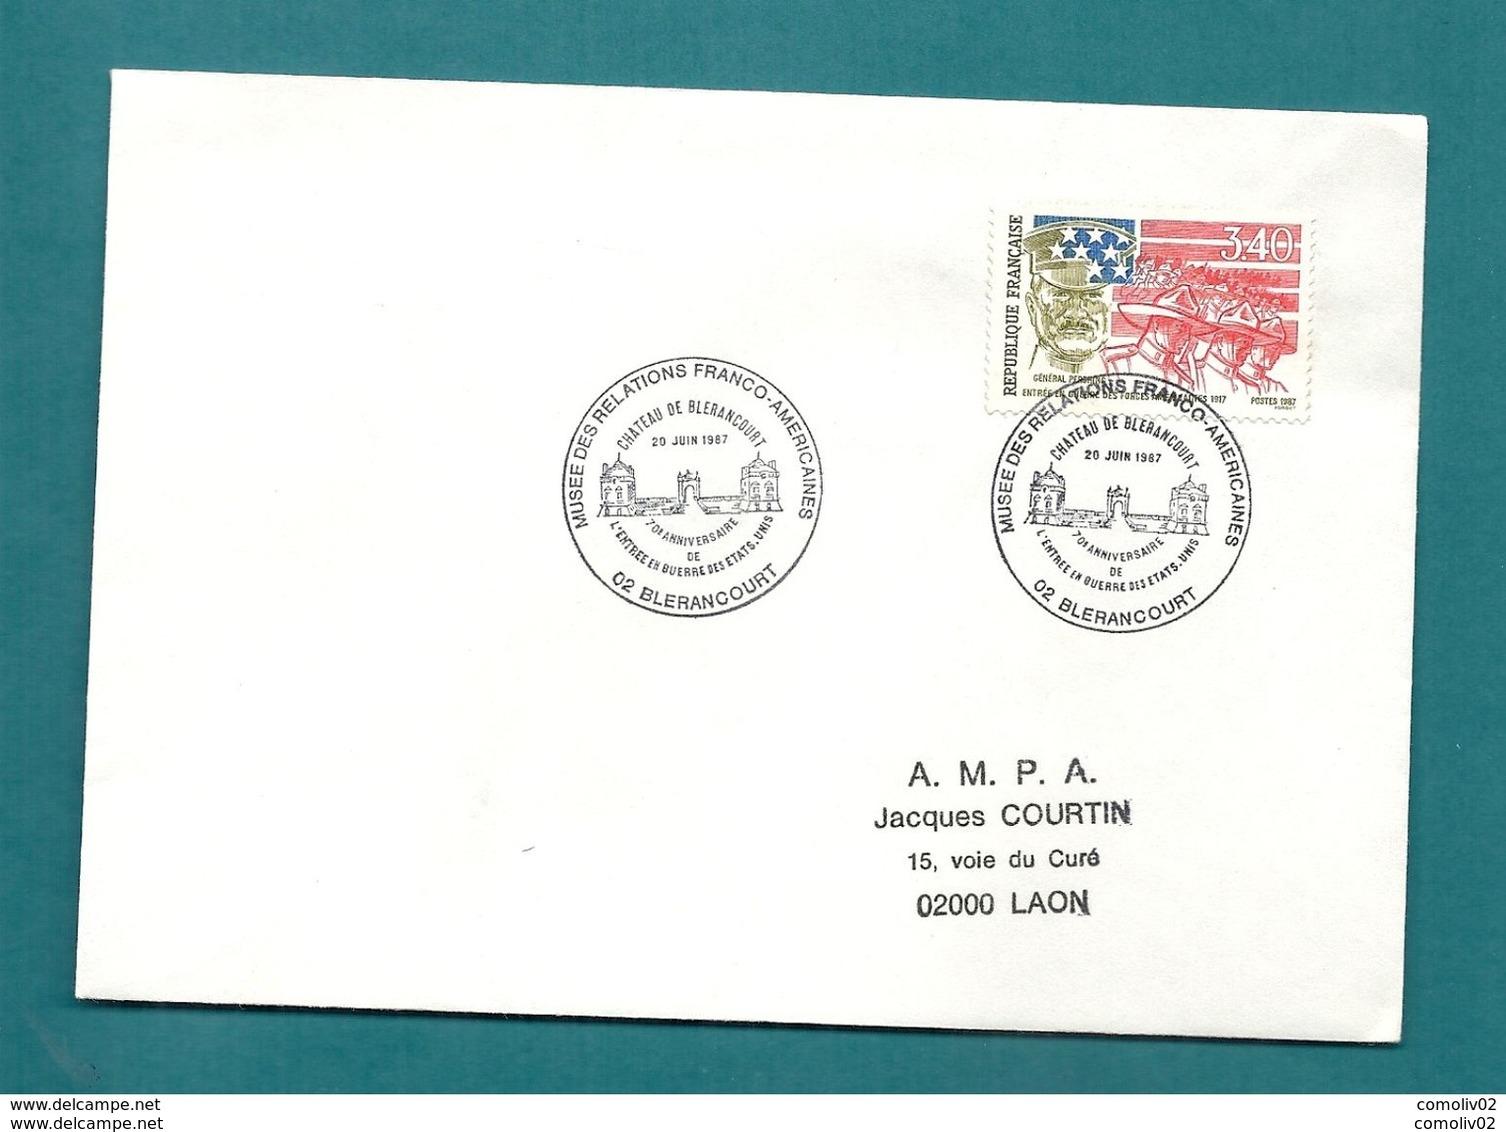 AISNE - BLERANCOURT - MUSEE DES RELATIONS FRANCO AMERICAINES. CHATEAU. 1987 - Gedenkstempel